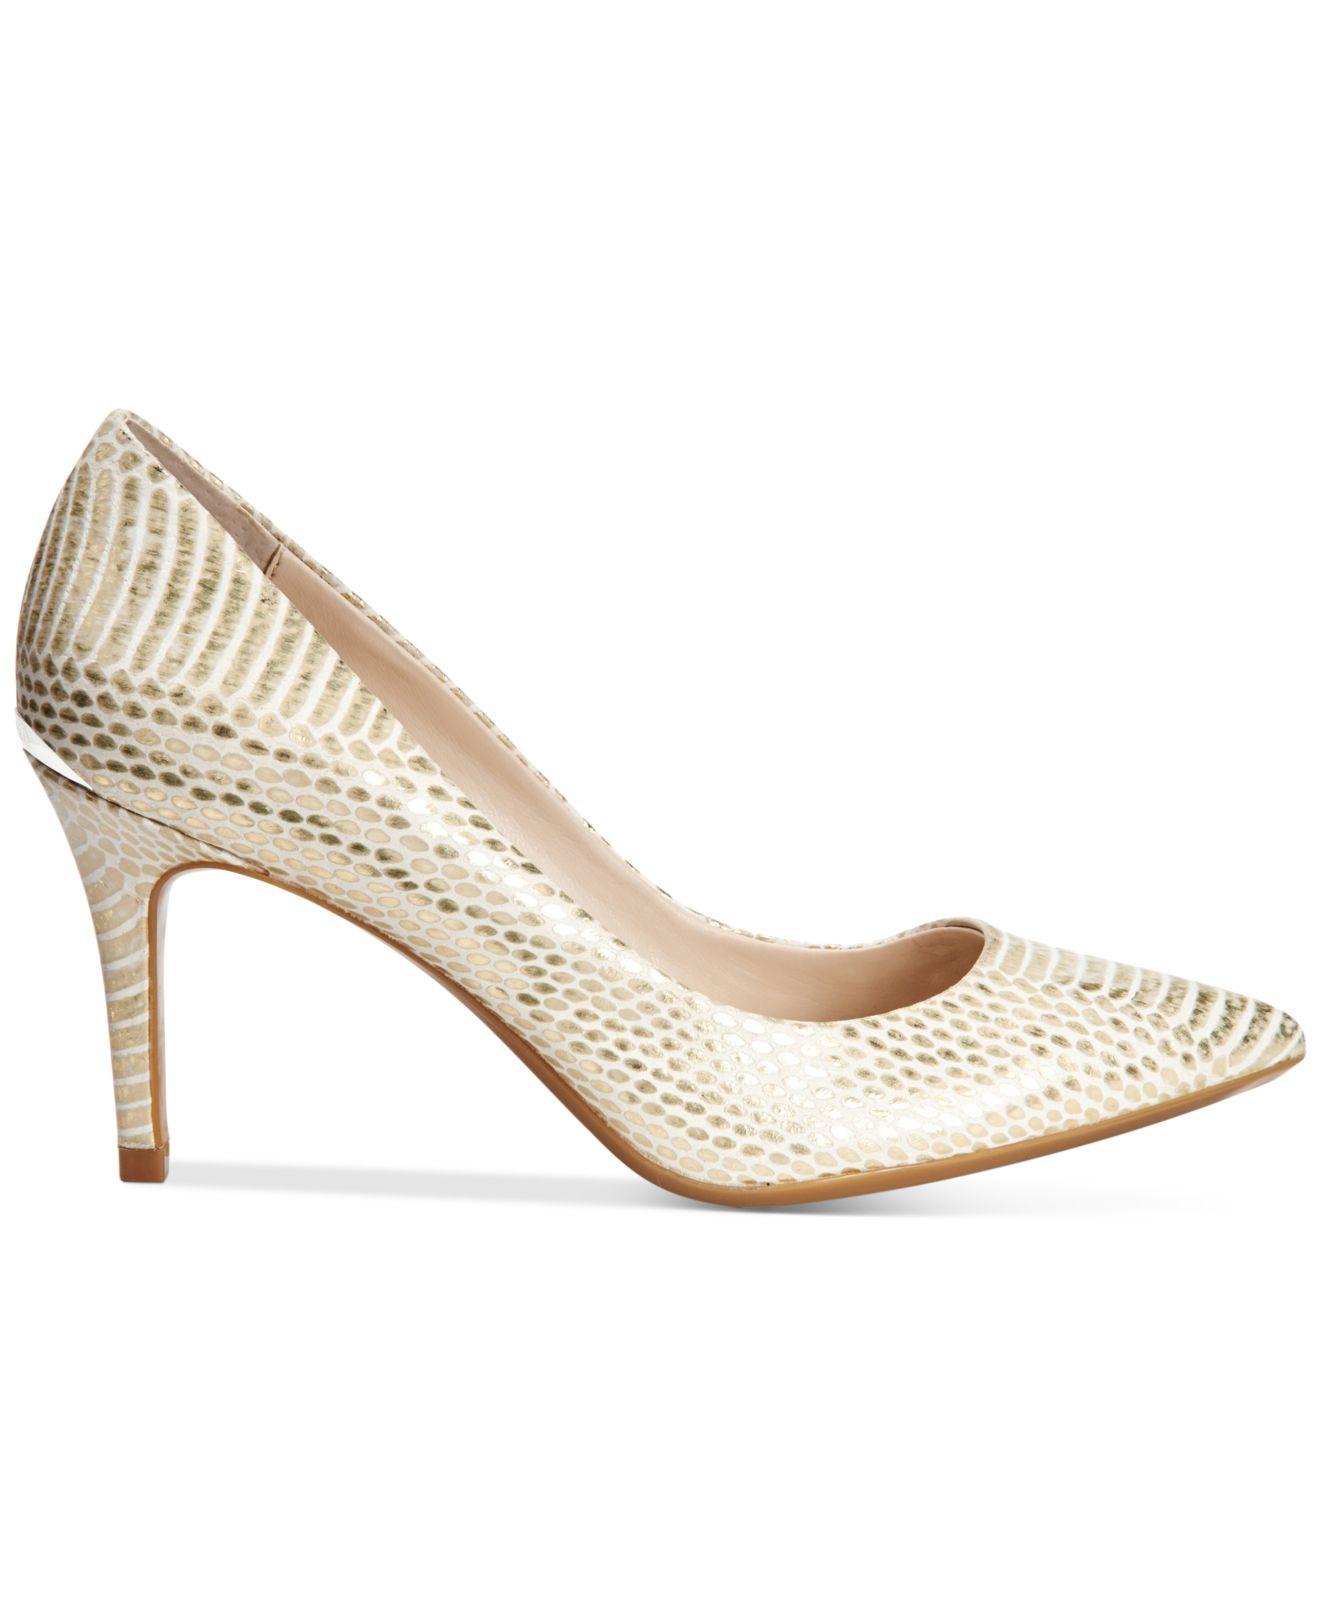 3b47433450fb3 Calvin Klein Metallic Women's Gayle Pointed-toe Pumps